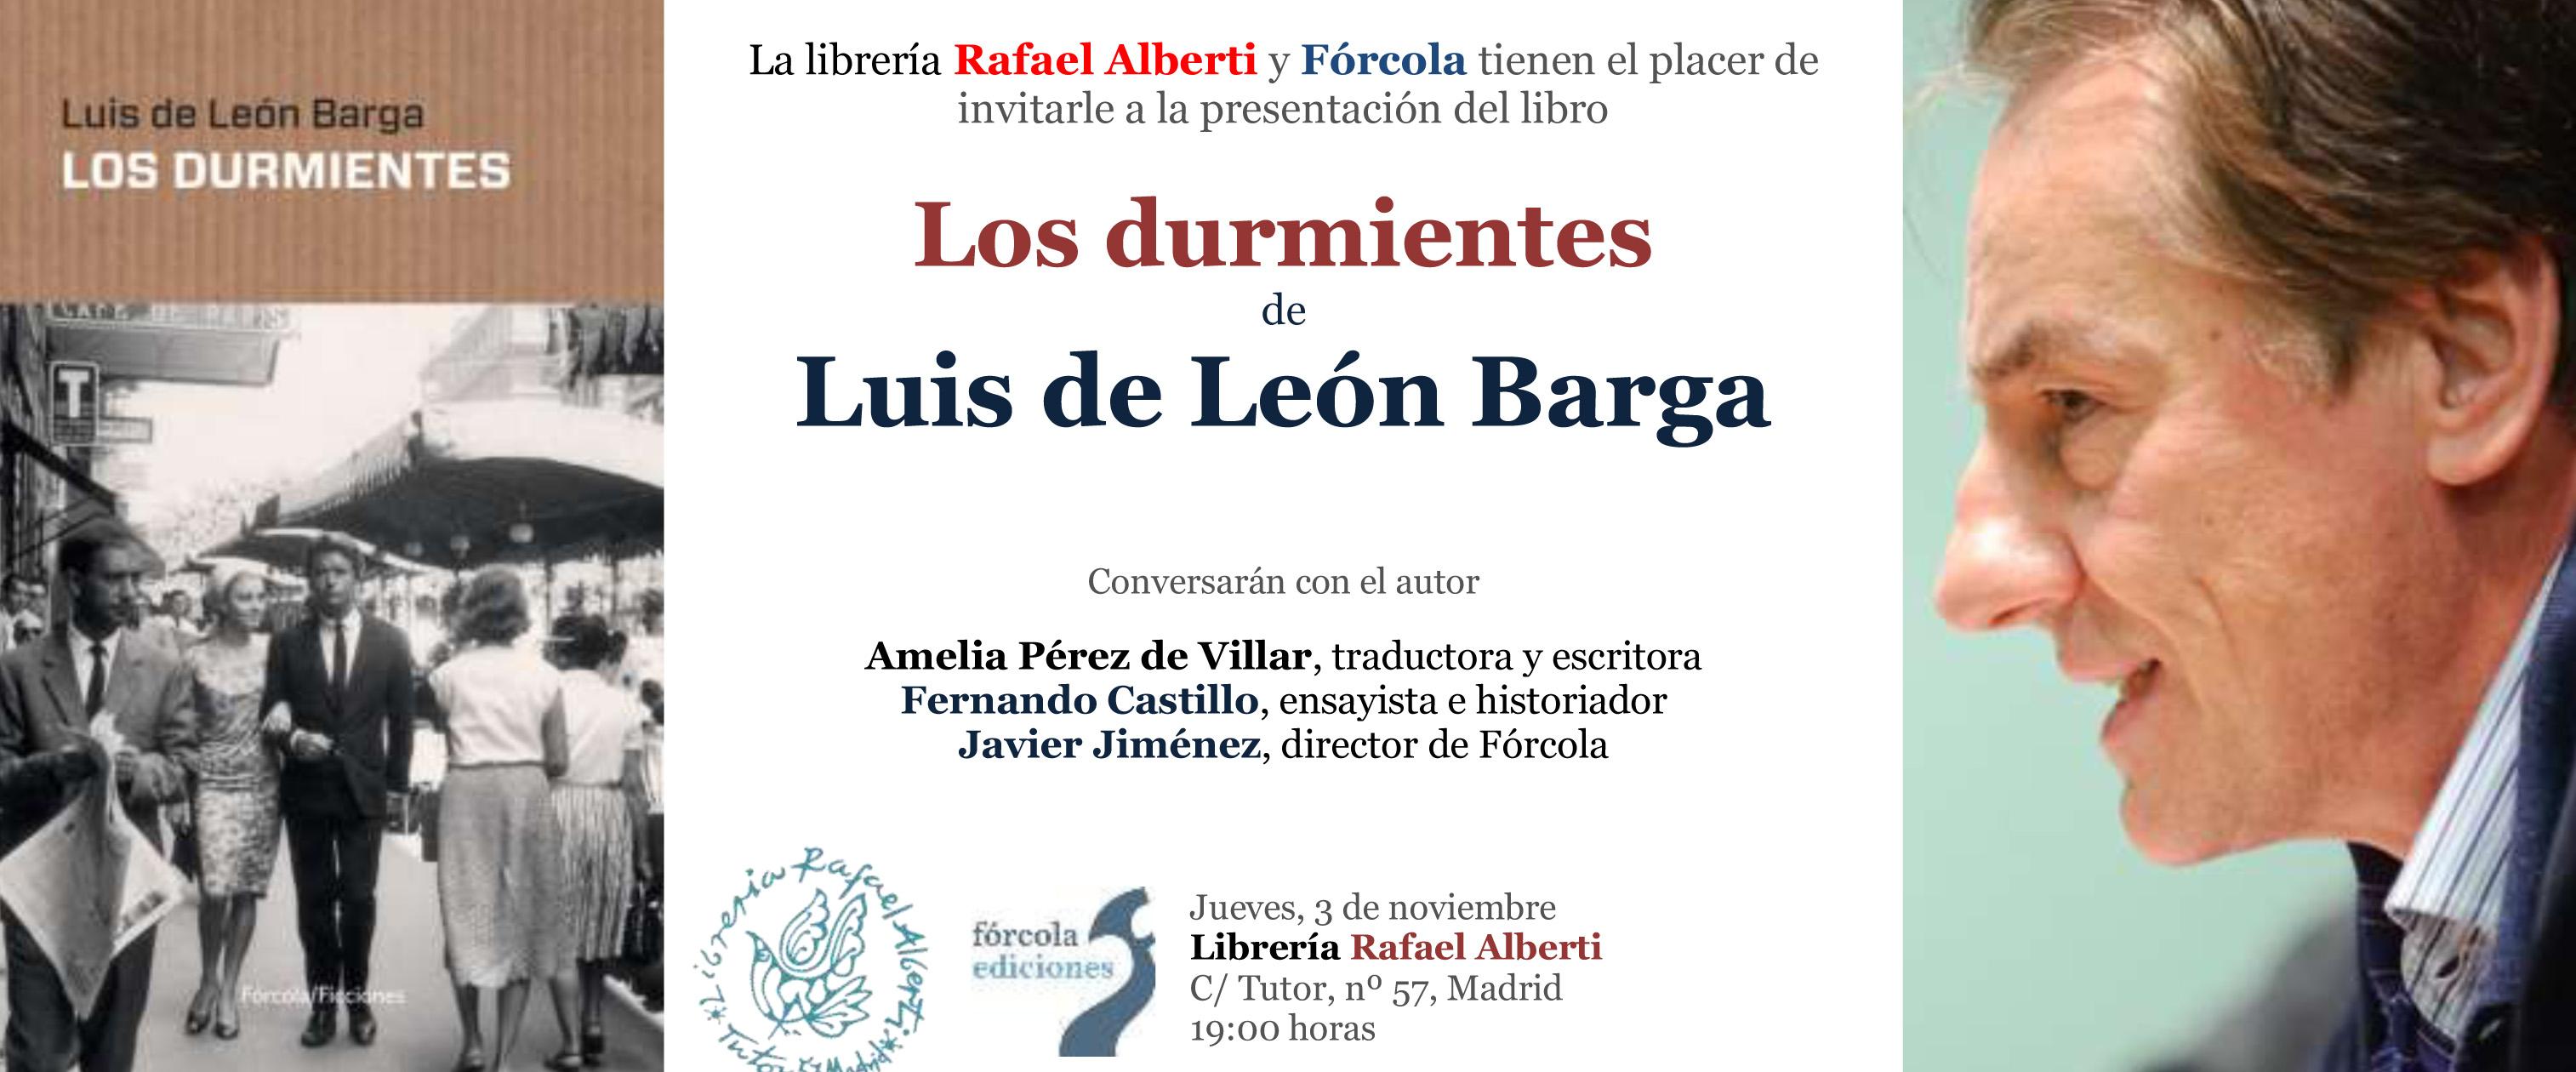 Invitacion_presentacion_Alberti_LuisdeLeon